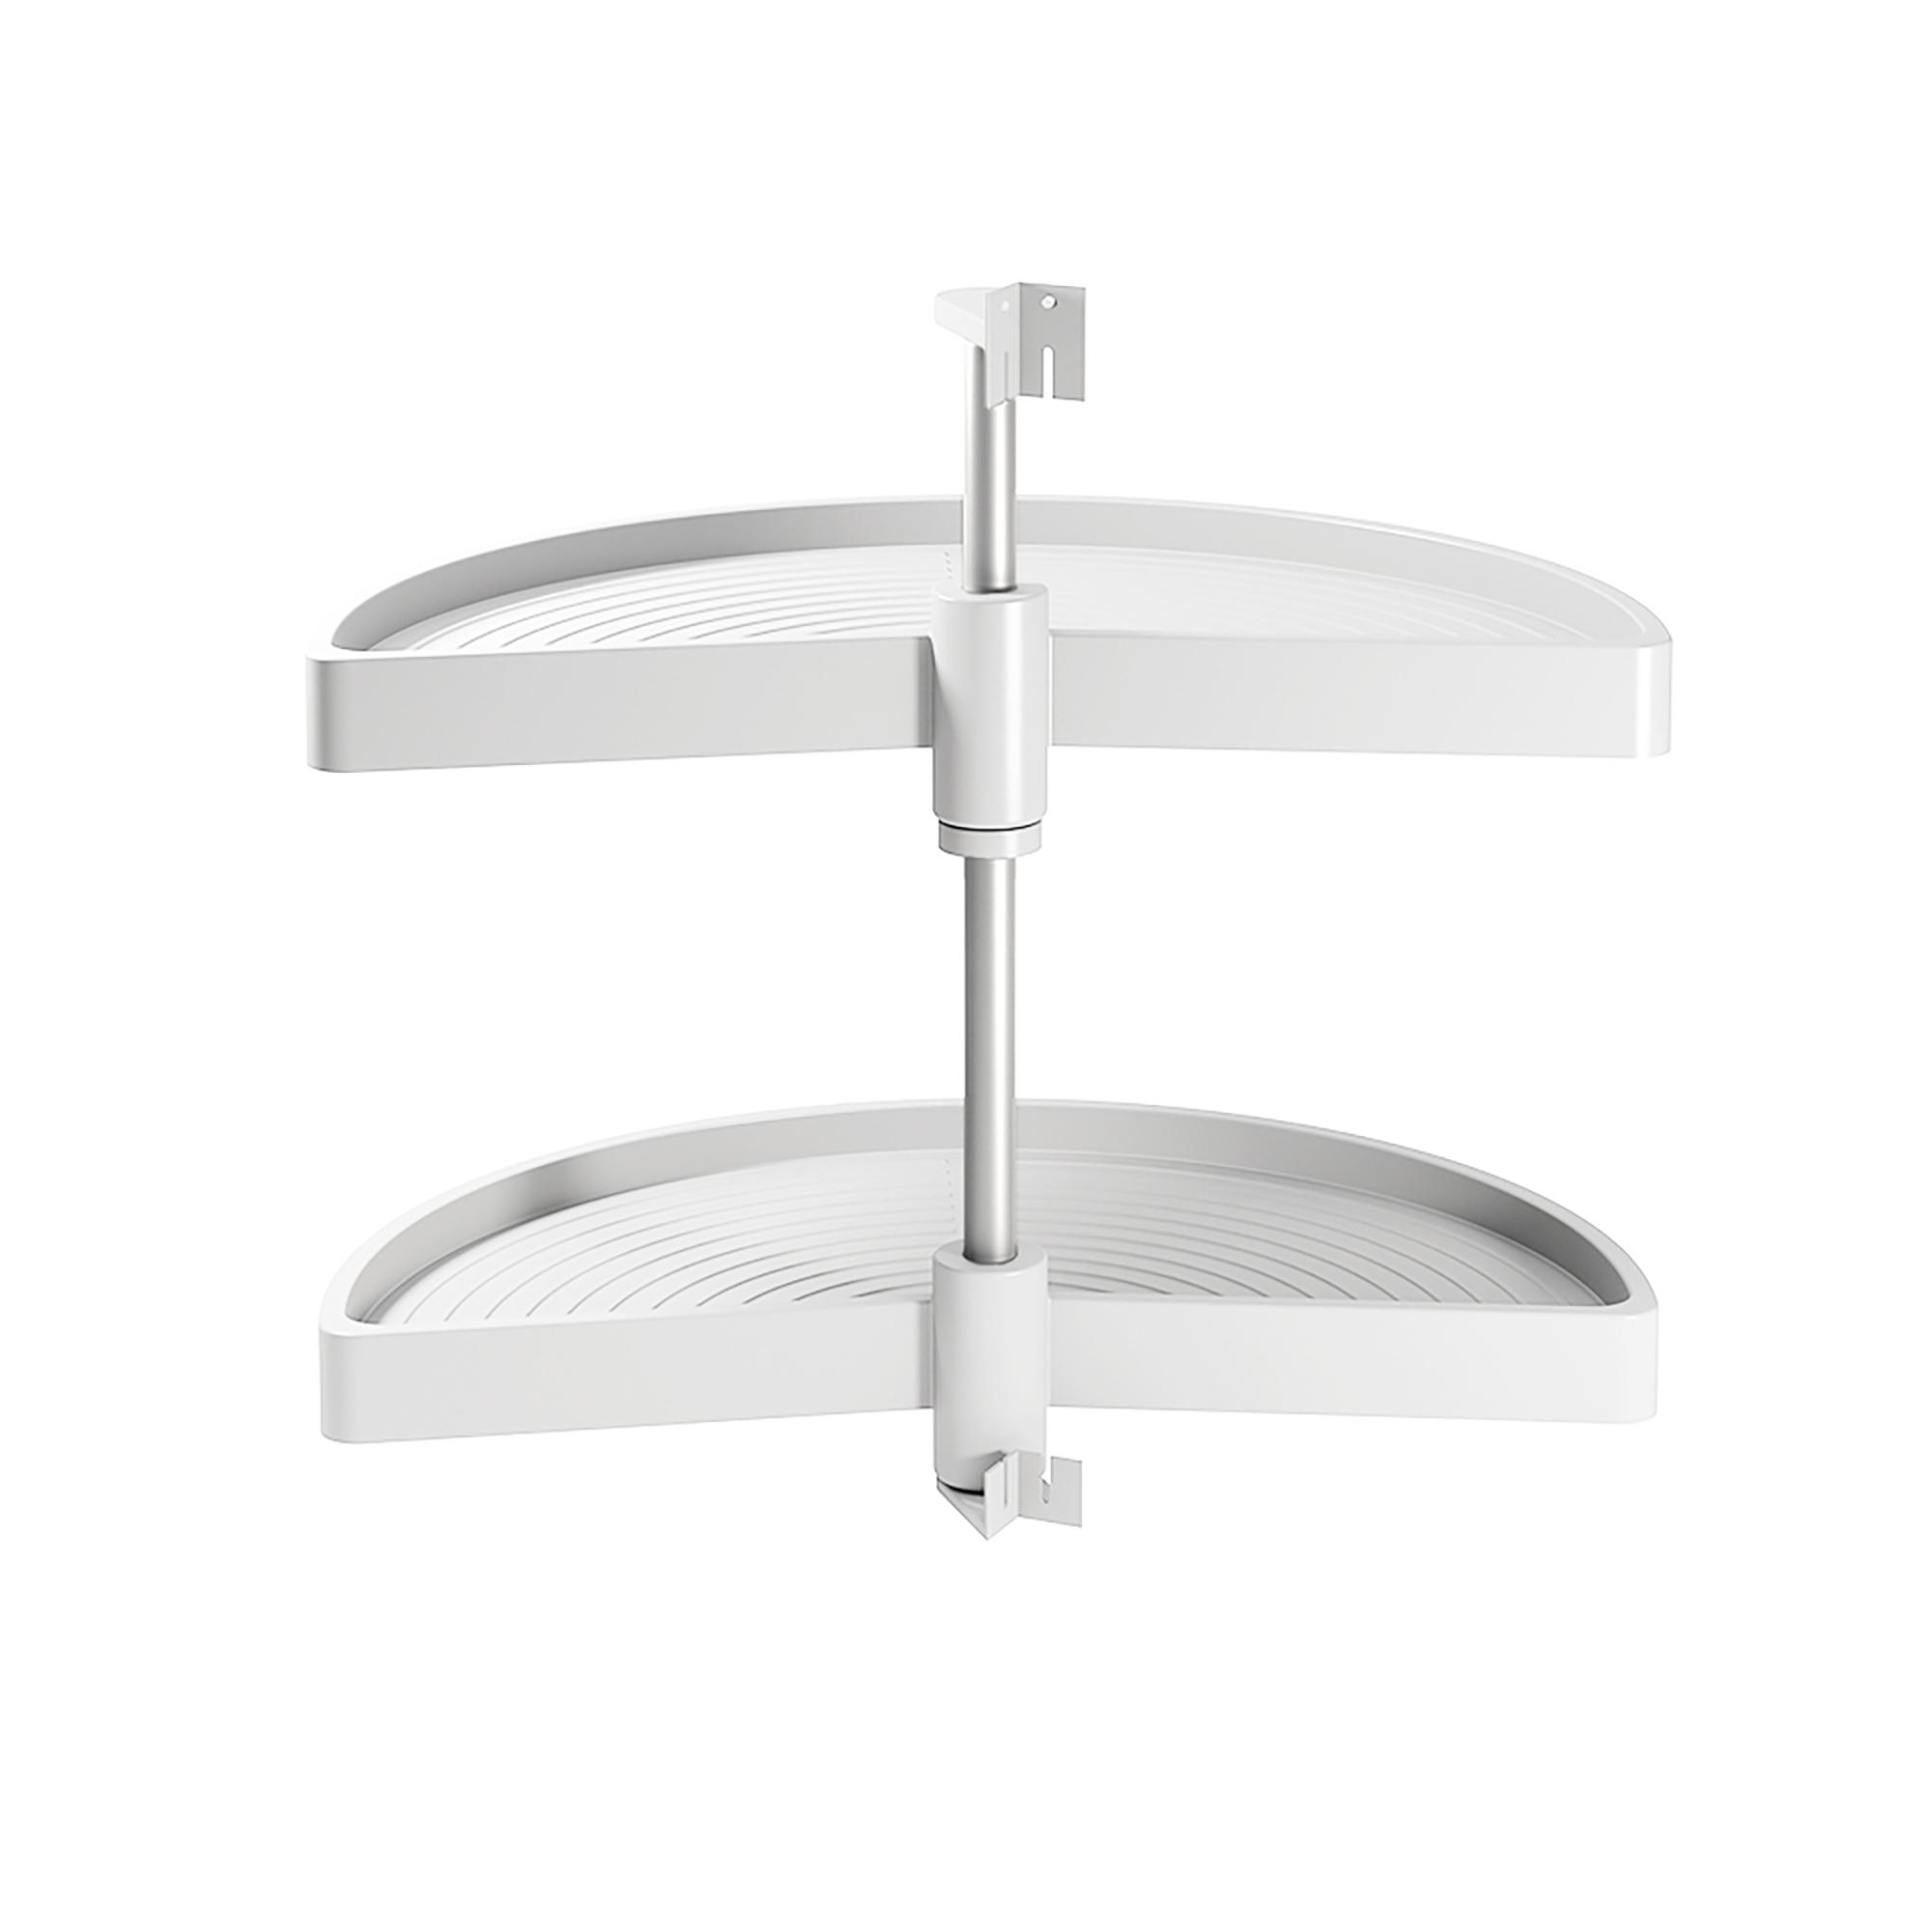 Emuca Cestello girevole per mobile da cucina, 180º, modulo 800 mm, Plastica, Bianco